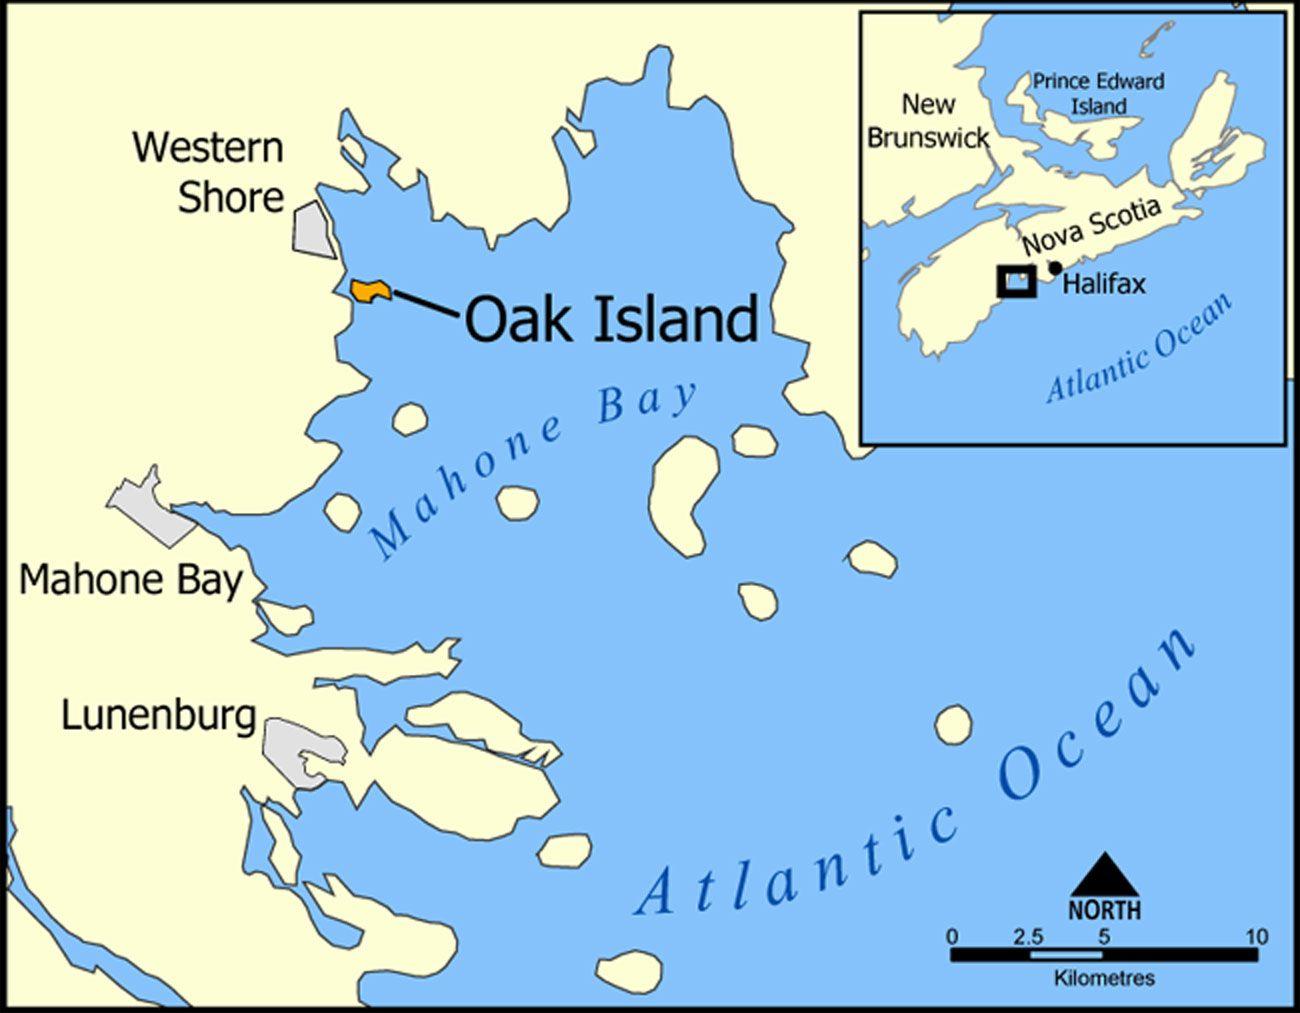 A map of Oak Island, Nova Scotia